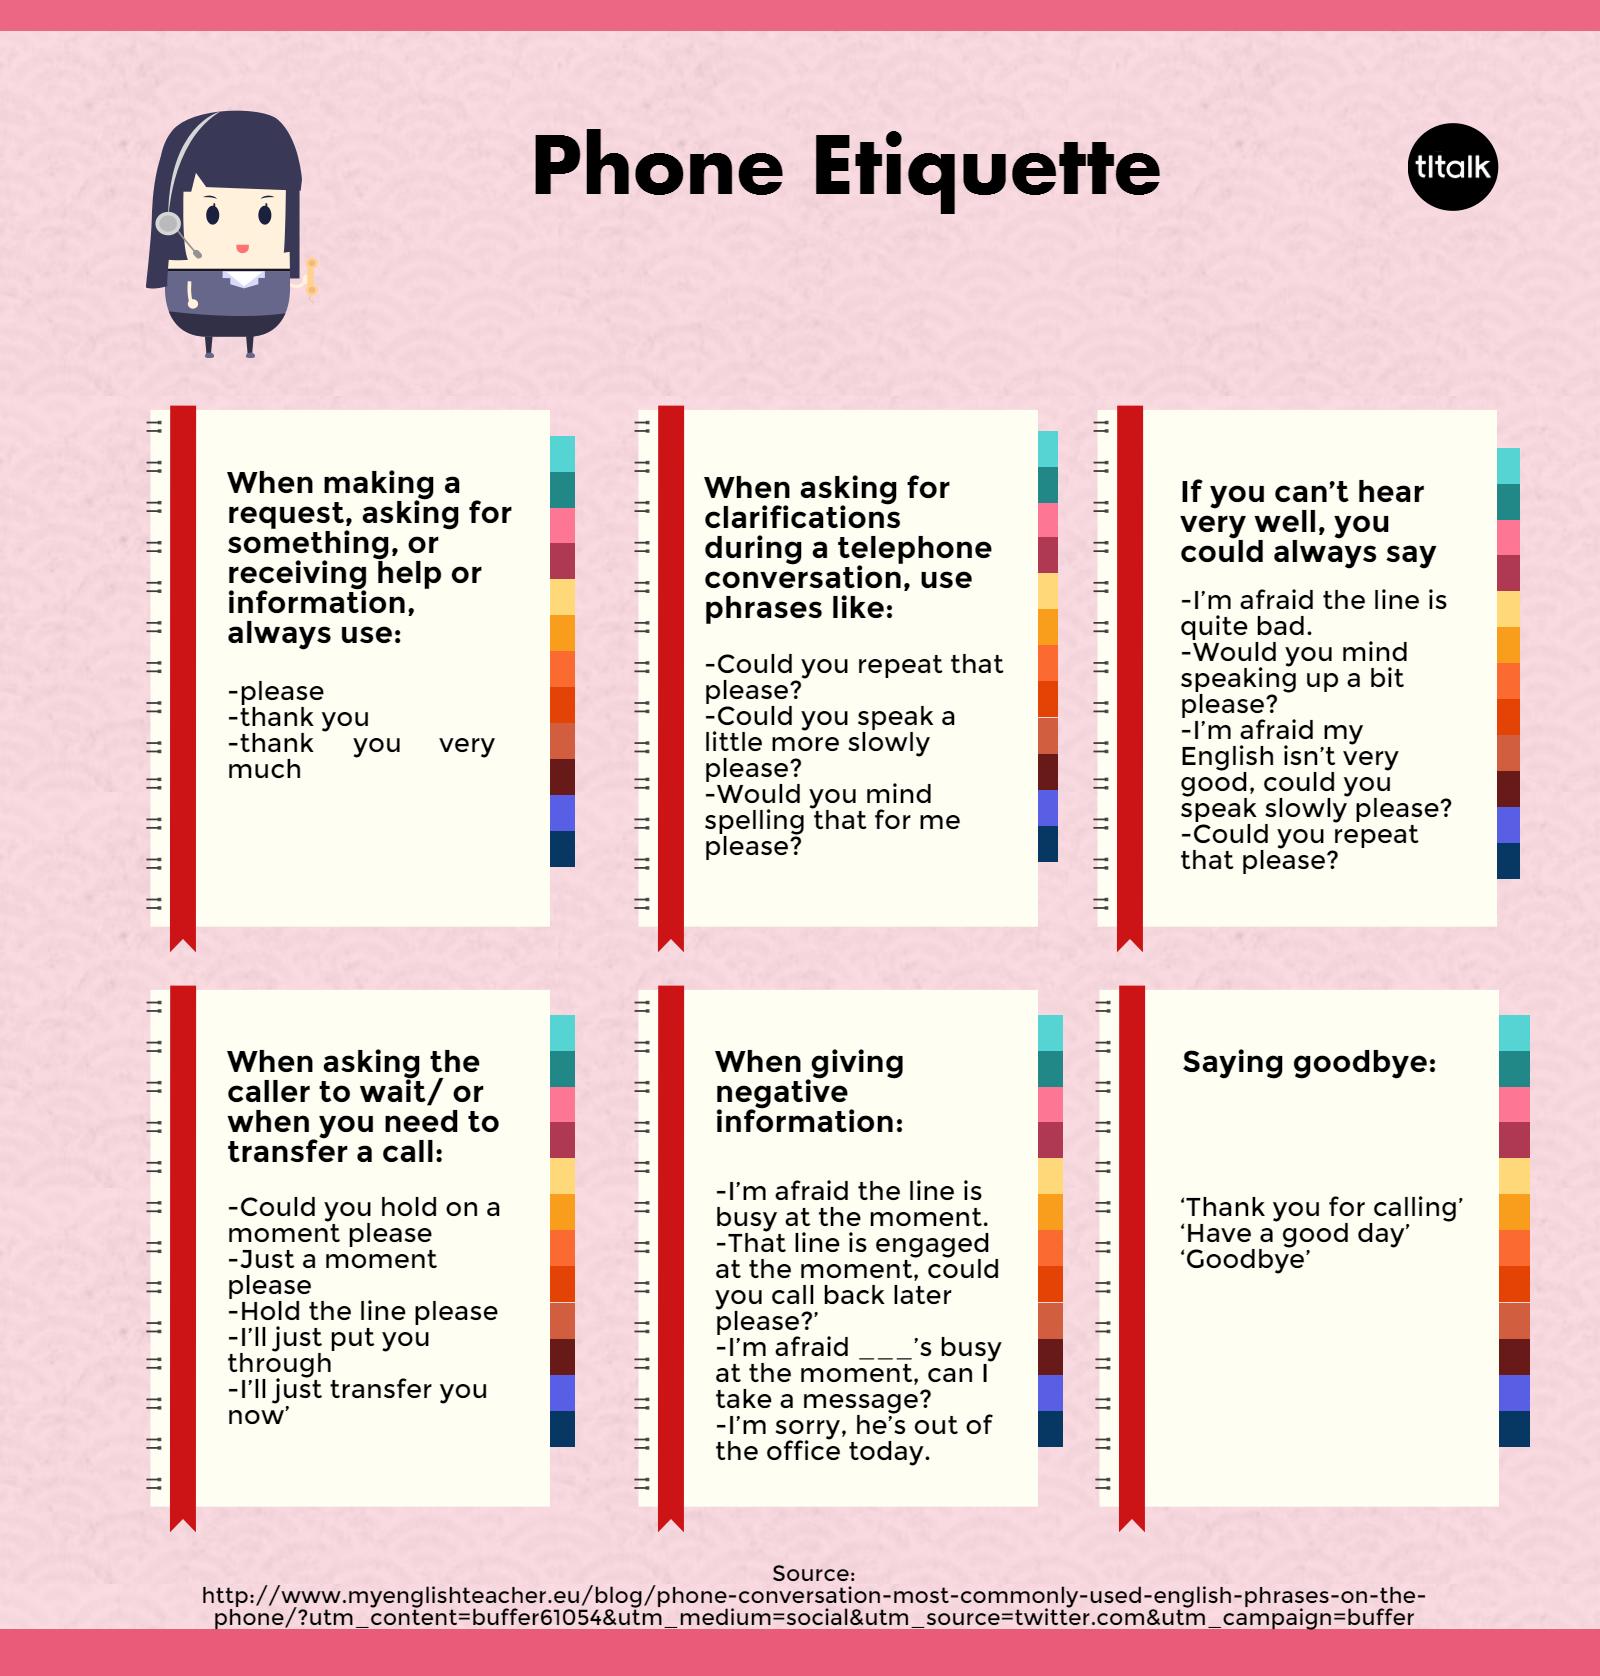 worksheet Telephone Etiquette Worksheet phone etiquette english language esl efl learn etiquette